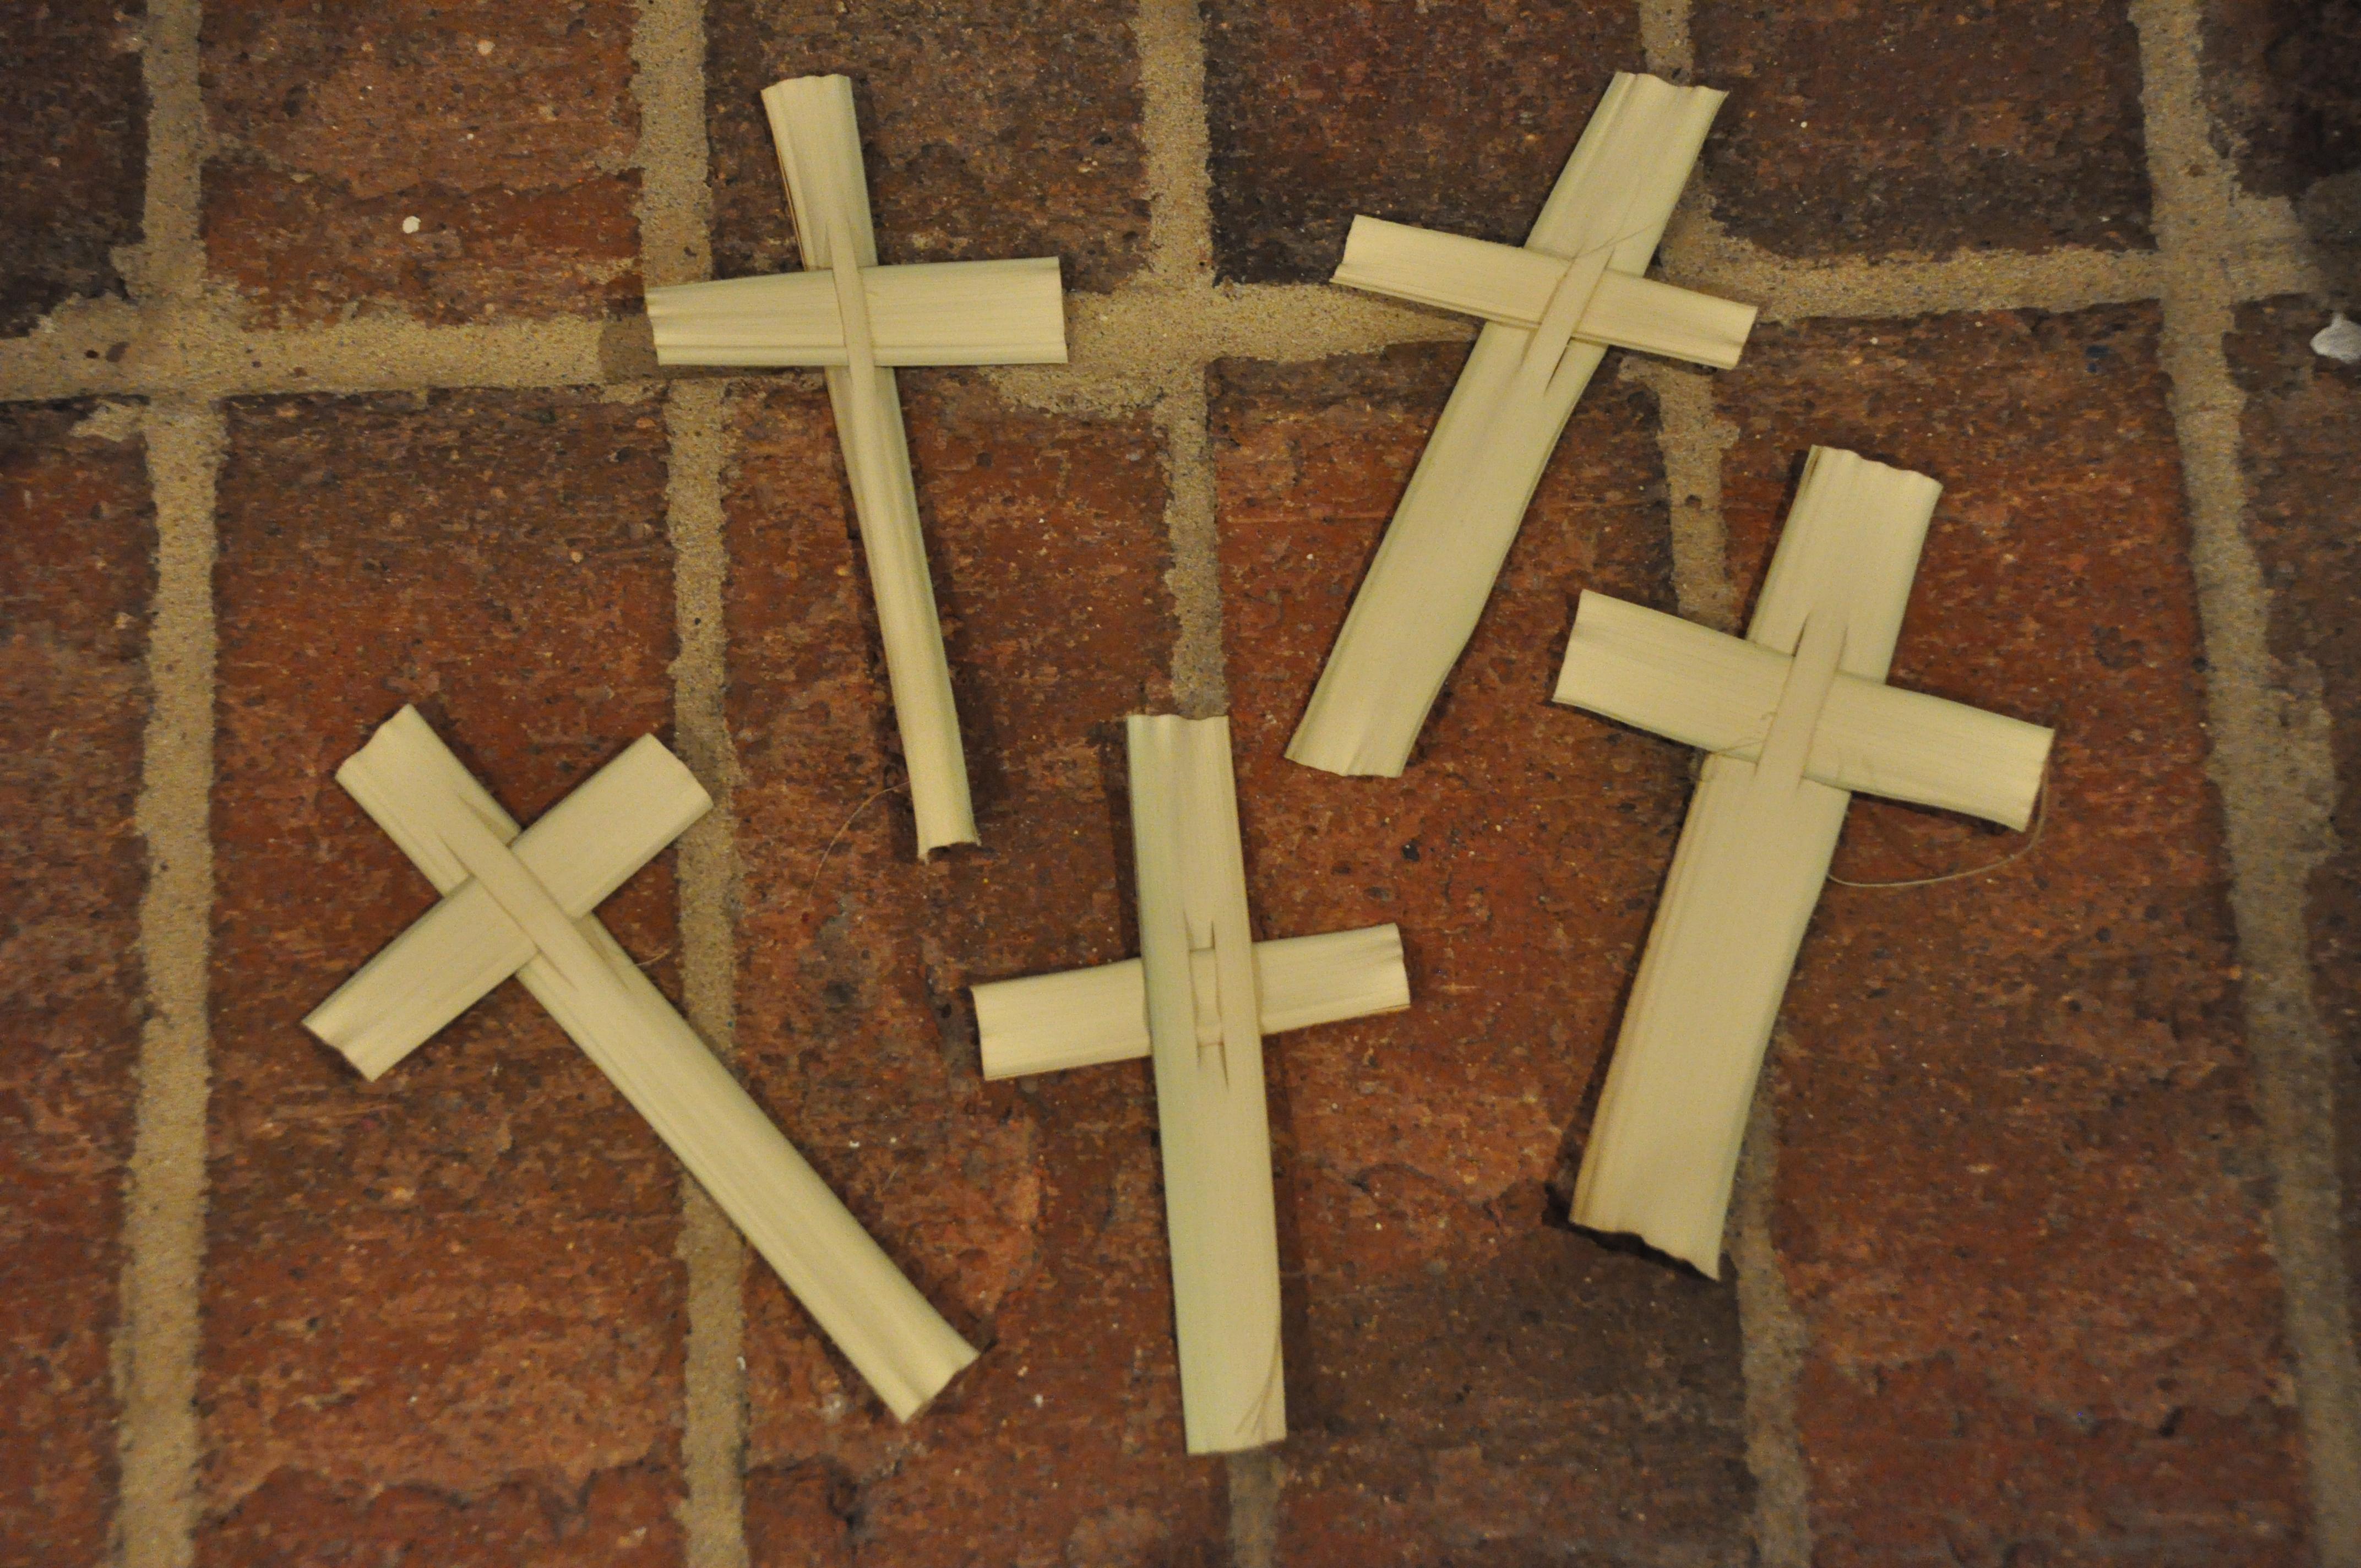 Easter ideas part 3 of 3 real deep stuff - Corn Husk Crosses